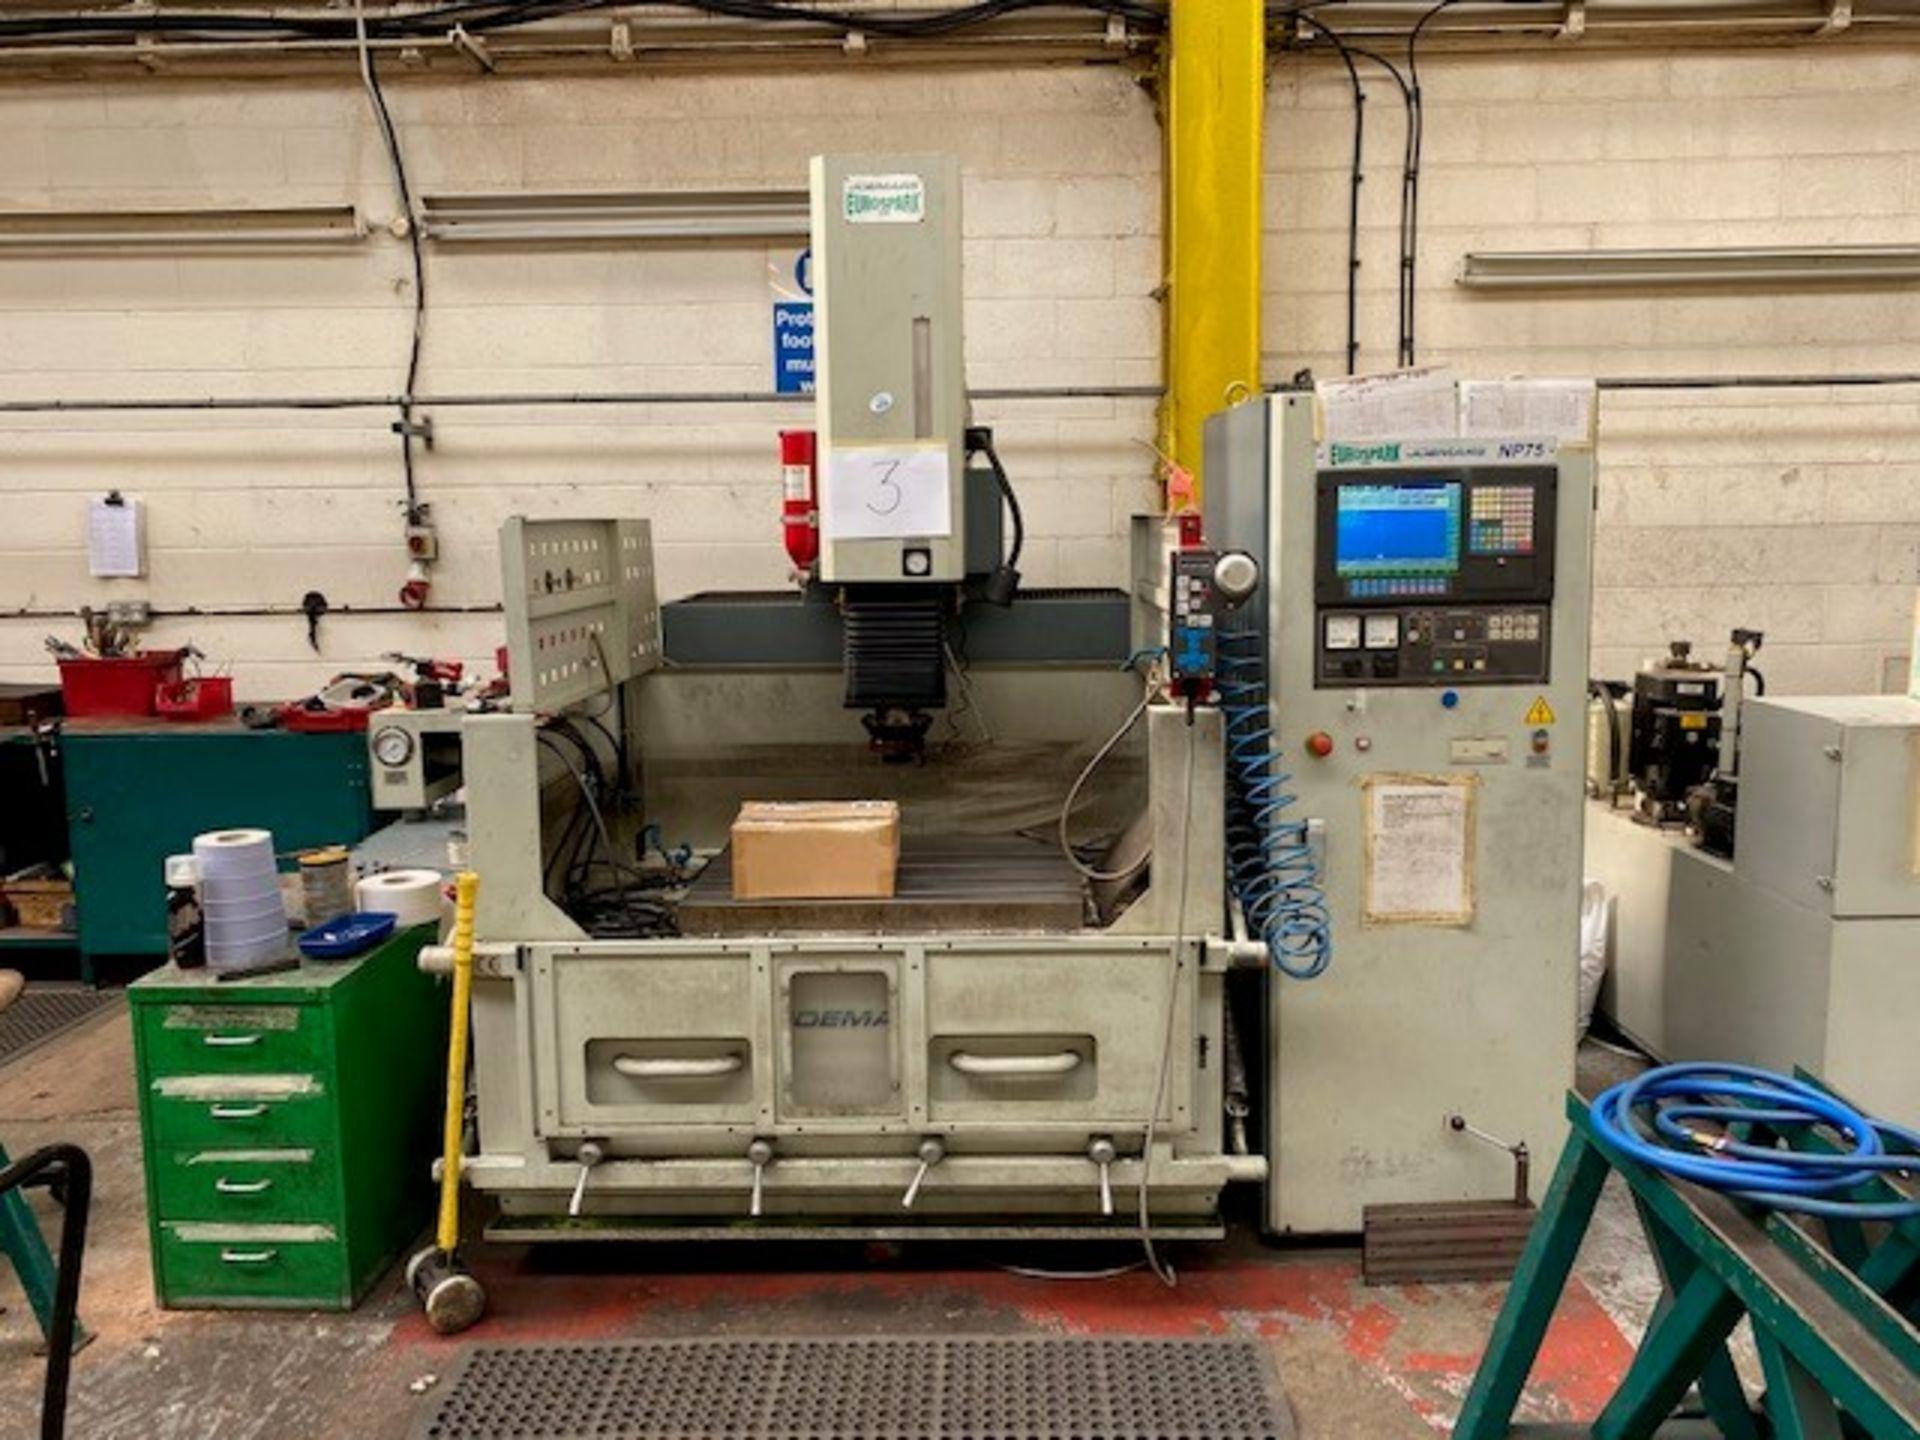 JOEMARS EURO SPARK EROSION CNC/EDM MACHINE WITH JOEMARS NP75 CONTROLLER MODEL: JMNC60 SERIAL No: